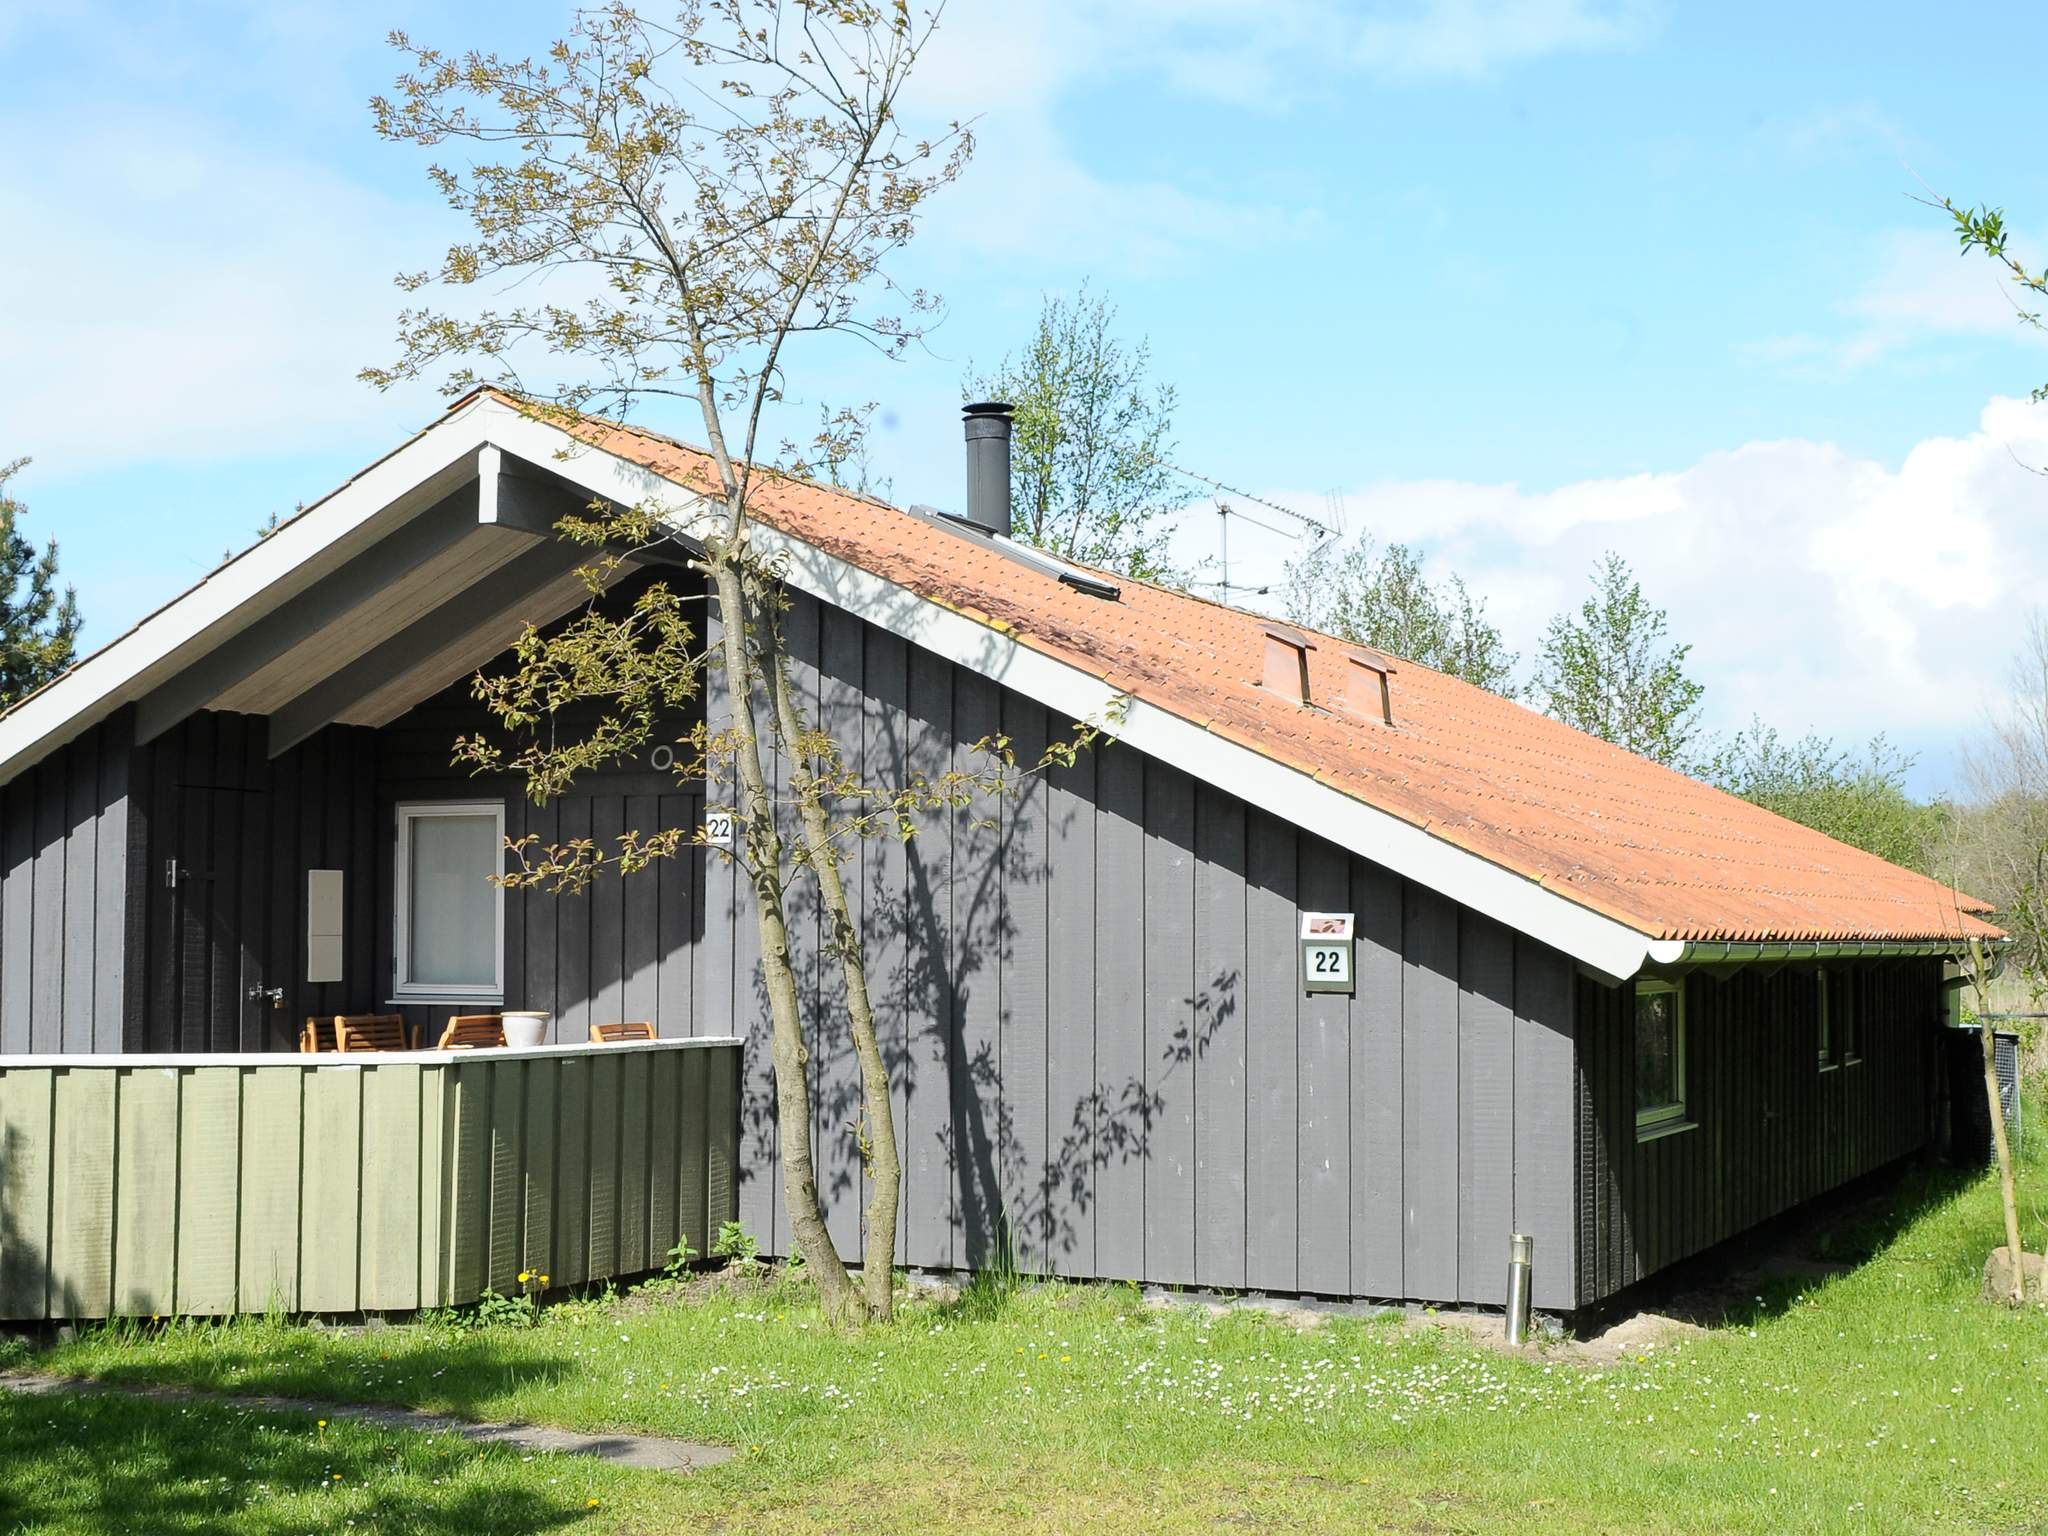 Ferienhaus Ristinge (93203), Ristinge, , Langeland, Dänemark, Bild 28